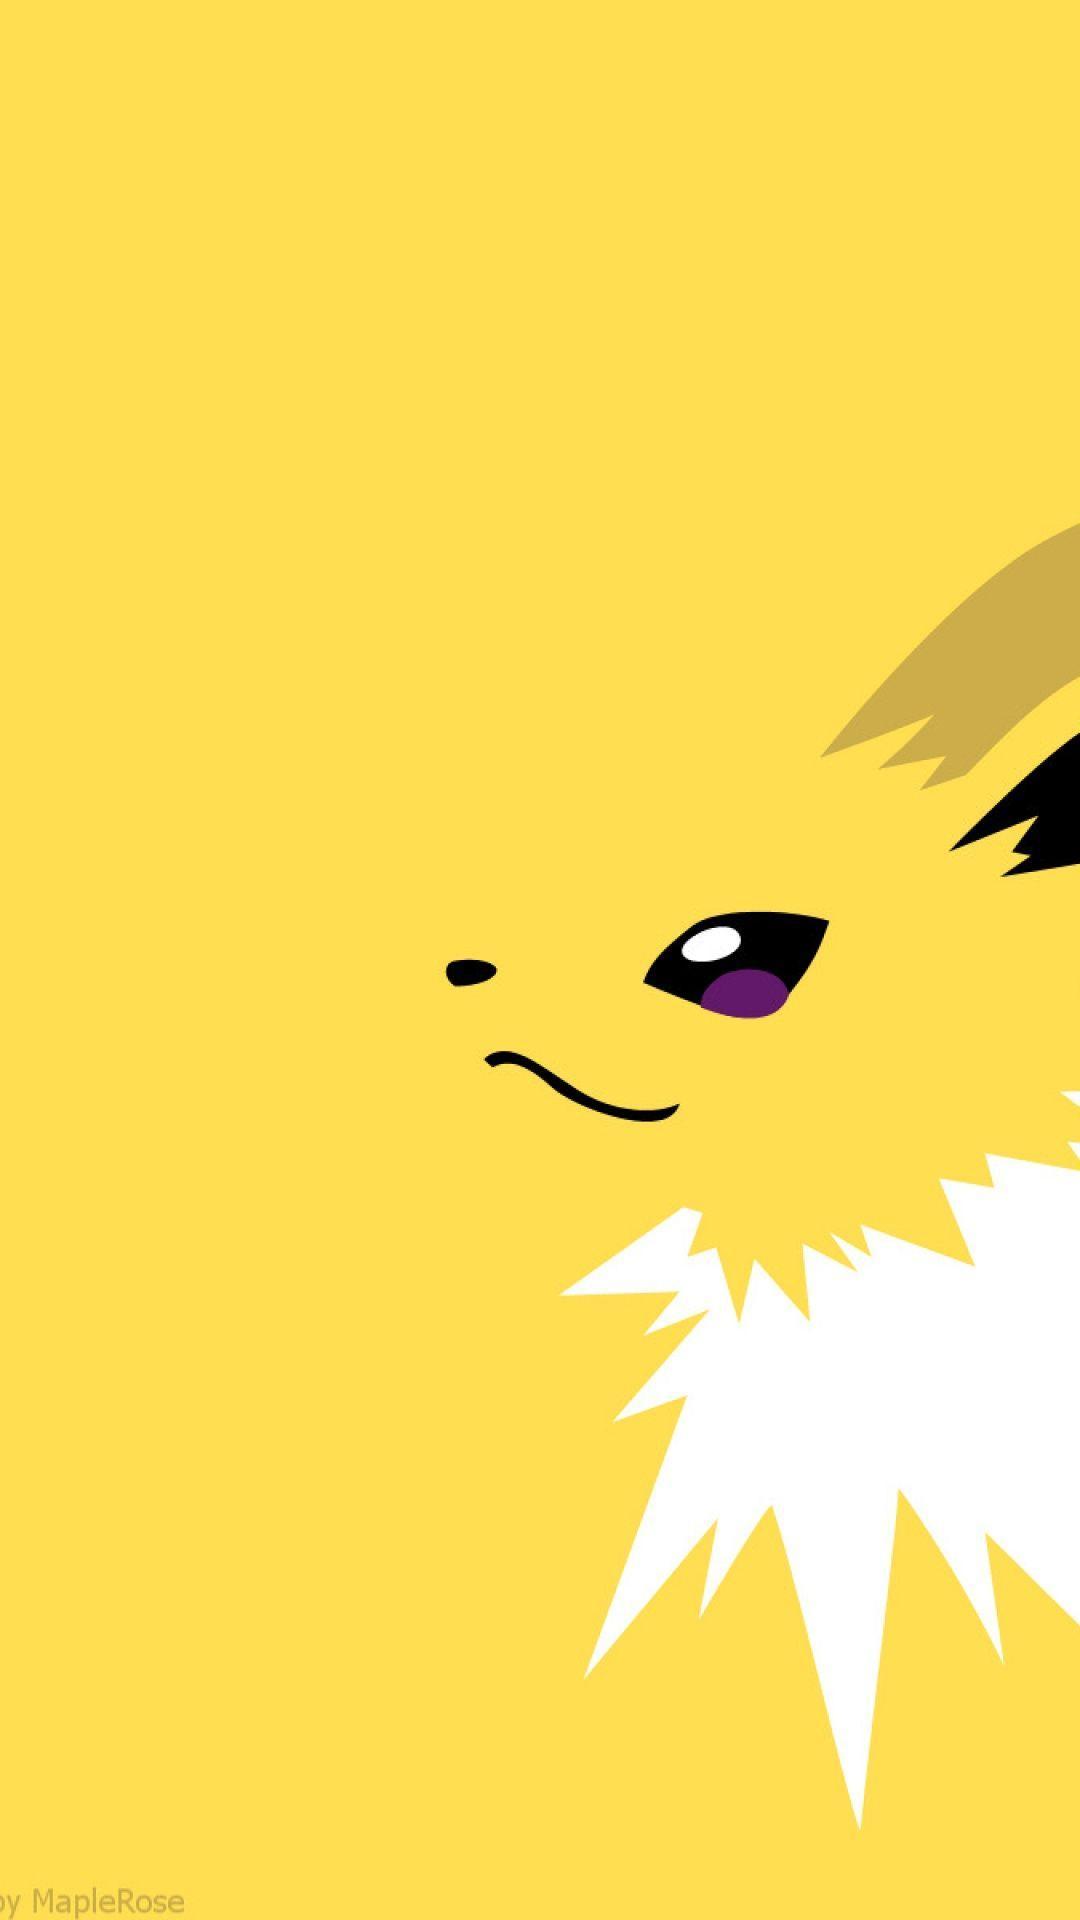 Pokemon Iphone Wallpapers Top Free Pokemon Iphone Backgrounds